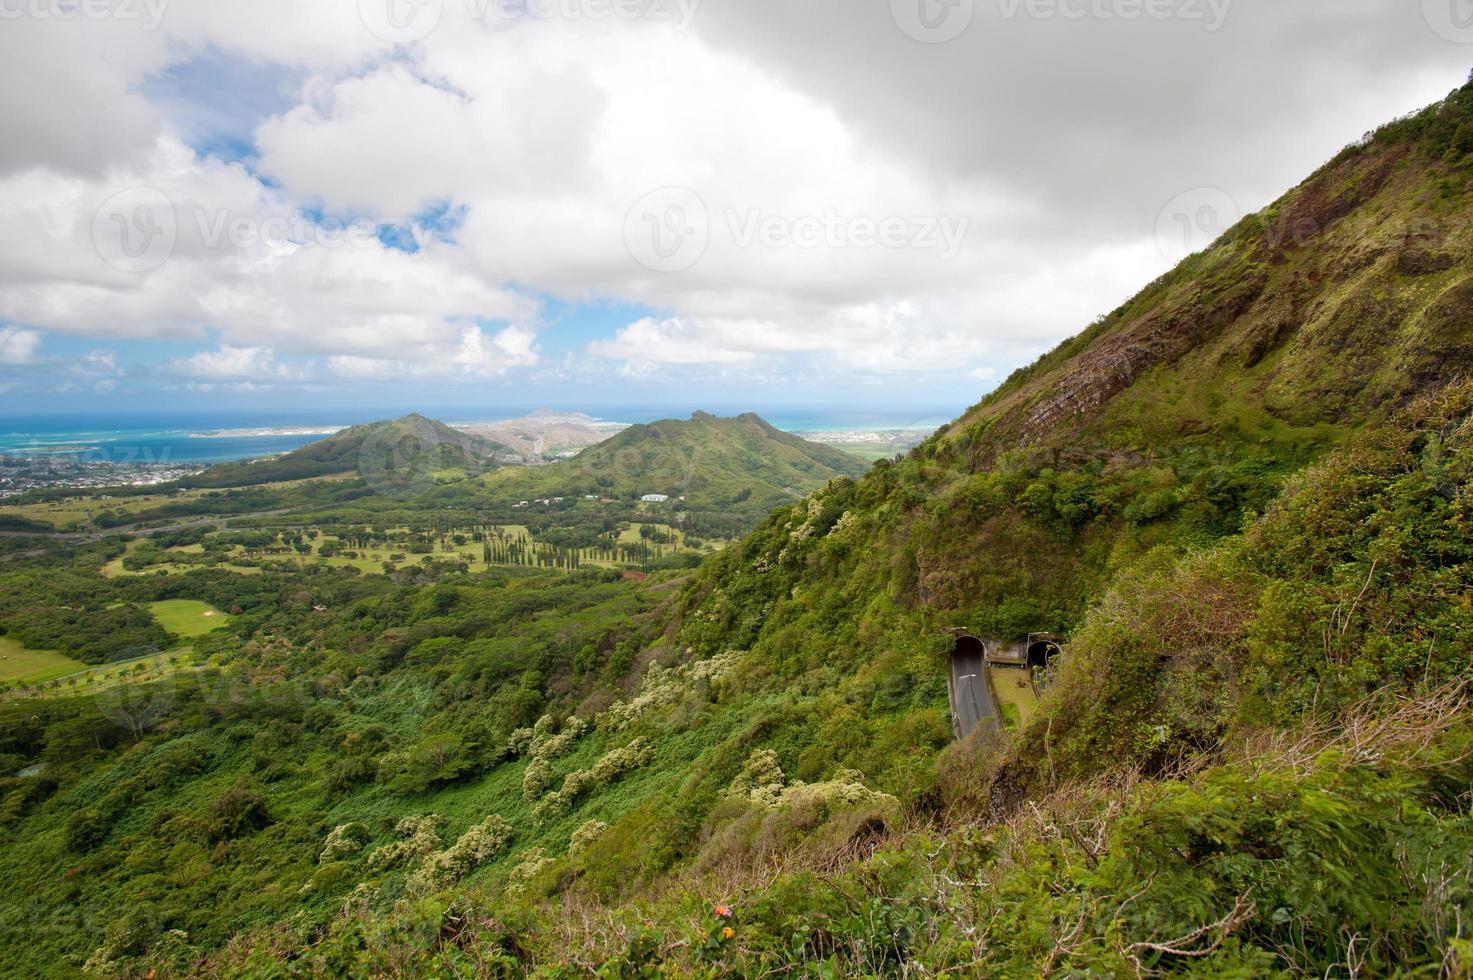 Blick auf Oahu vom Pali Lookout. foto